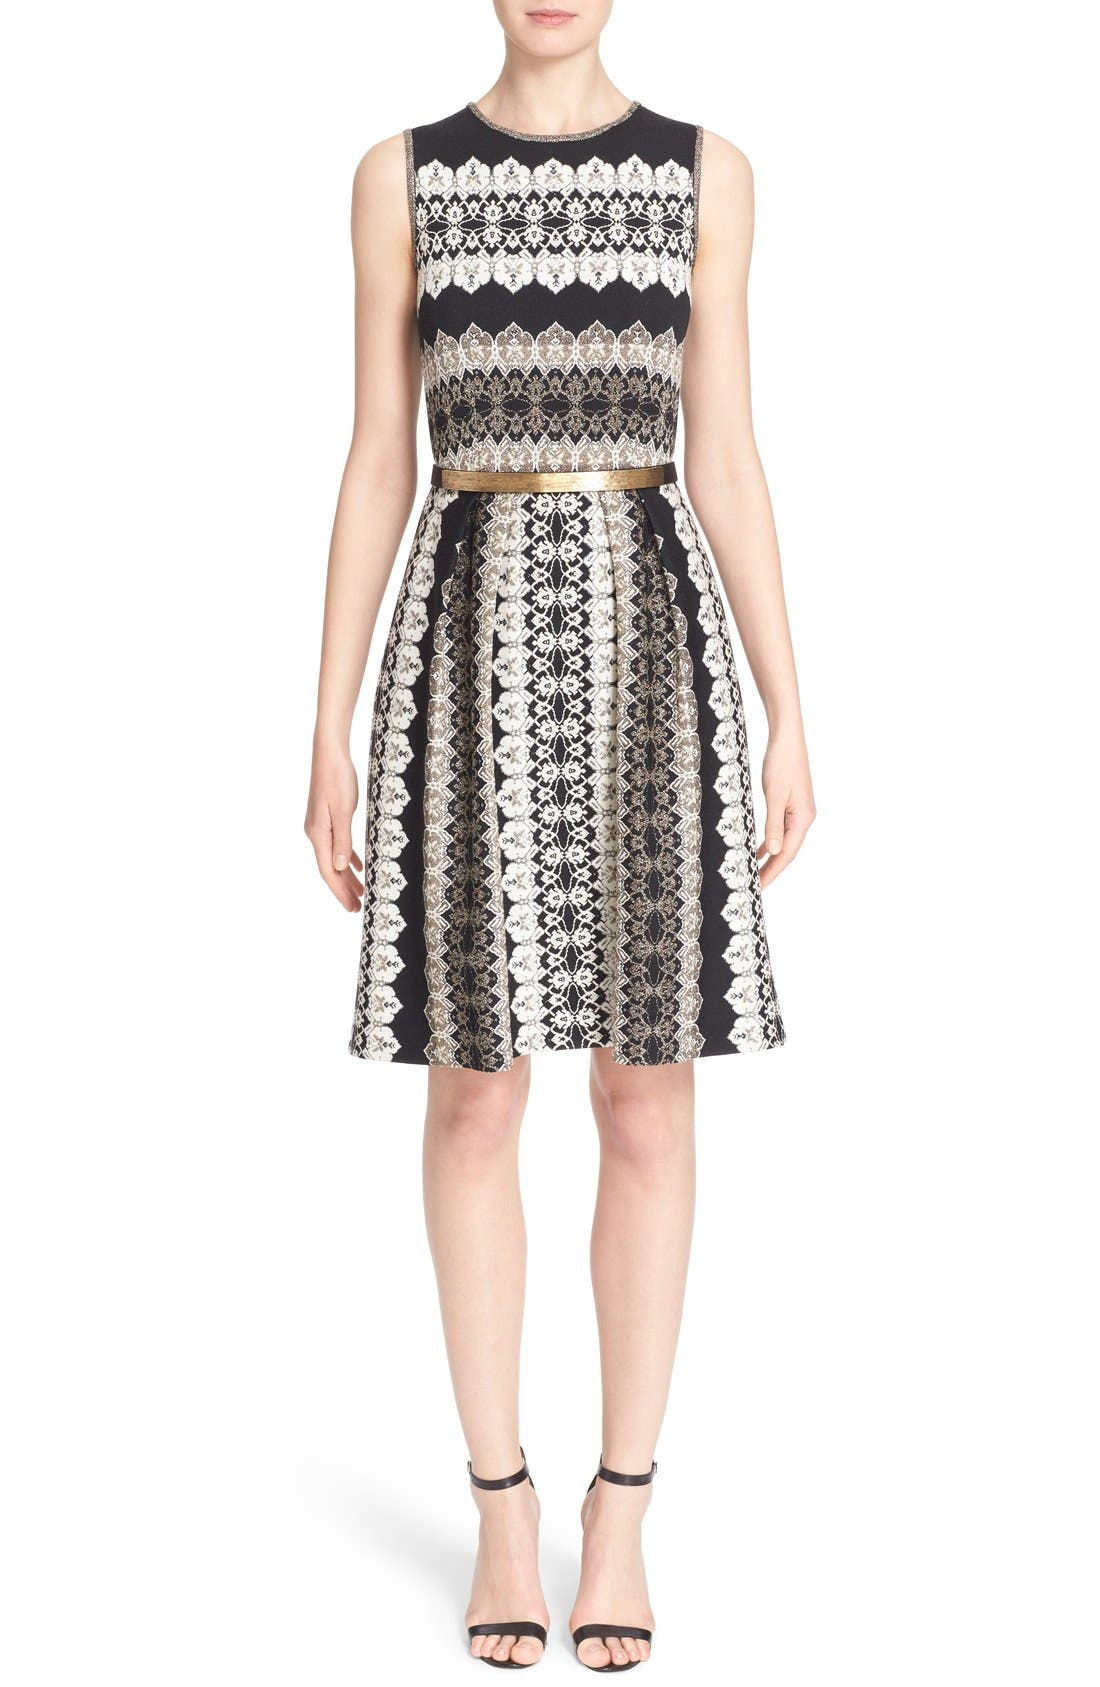 Alternate Image 1 Selected - St. John Collection Jeweled Shimmer Knit Dress